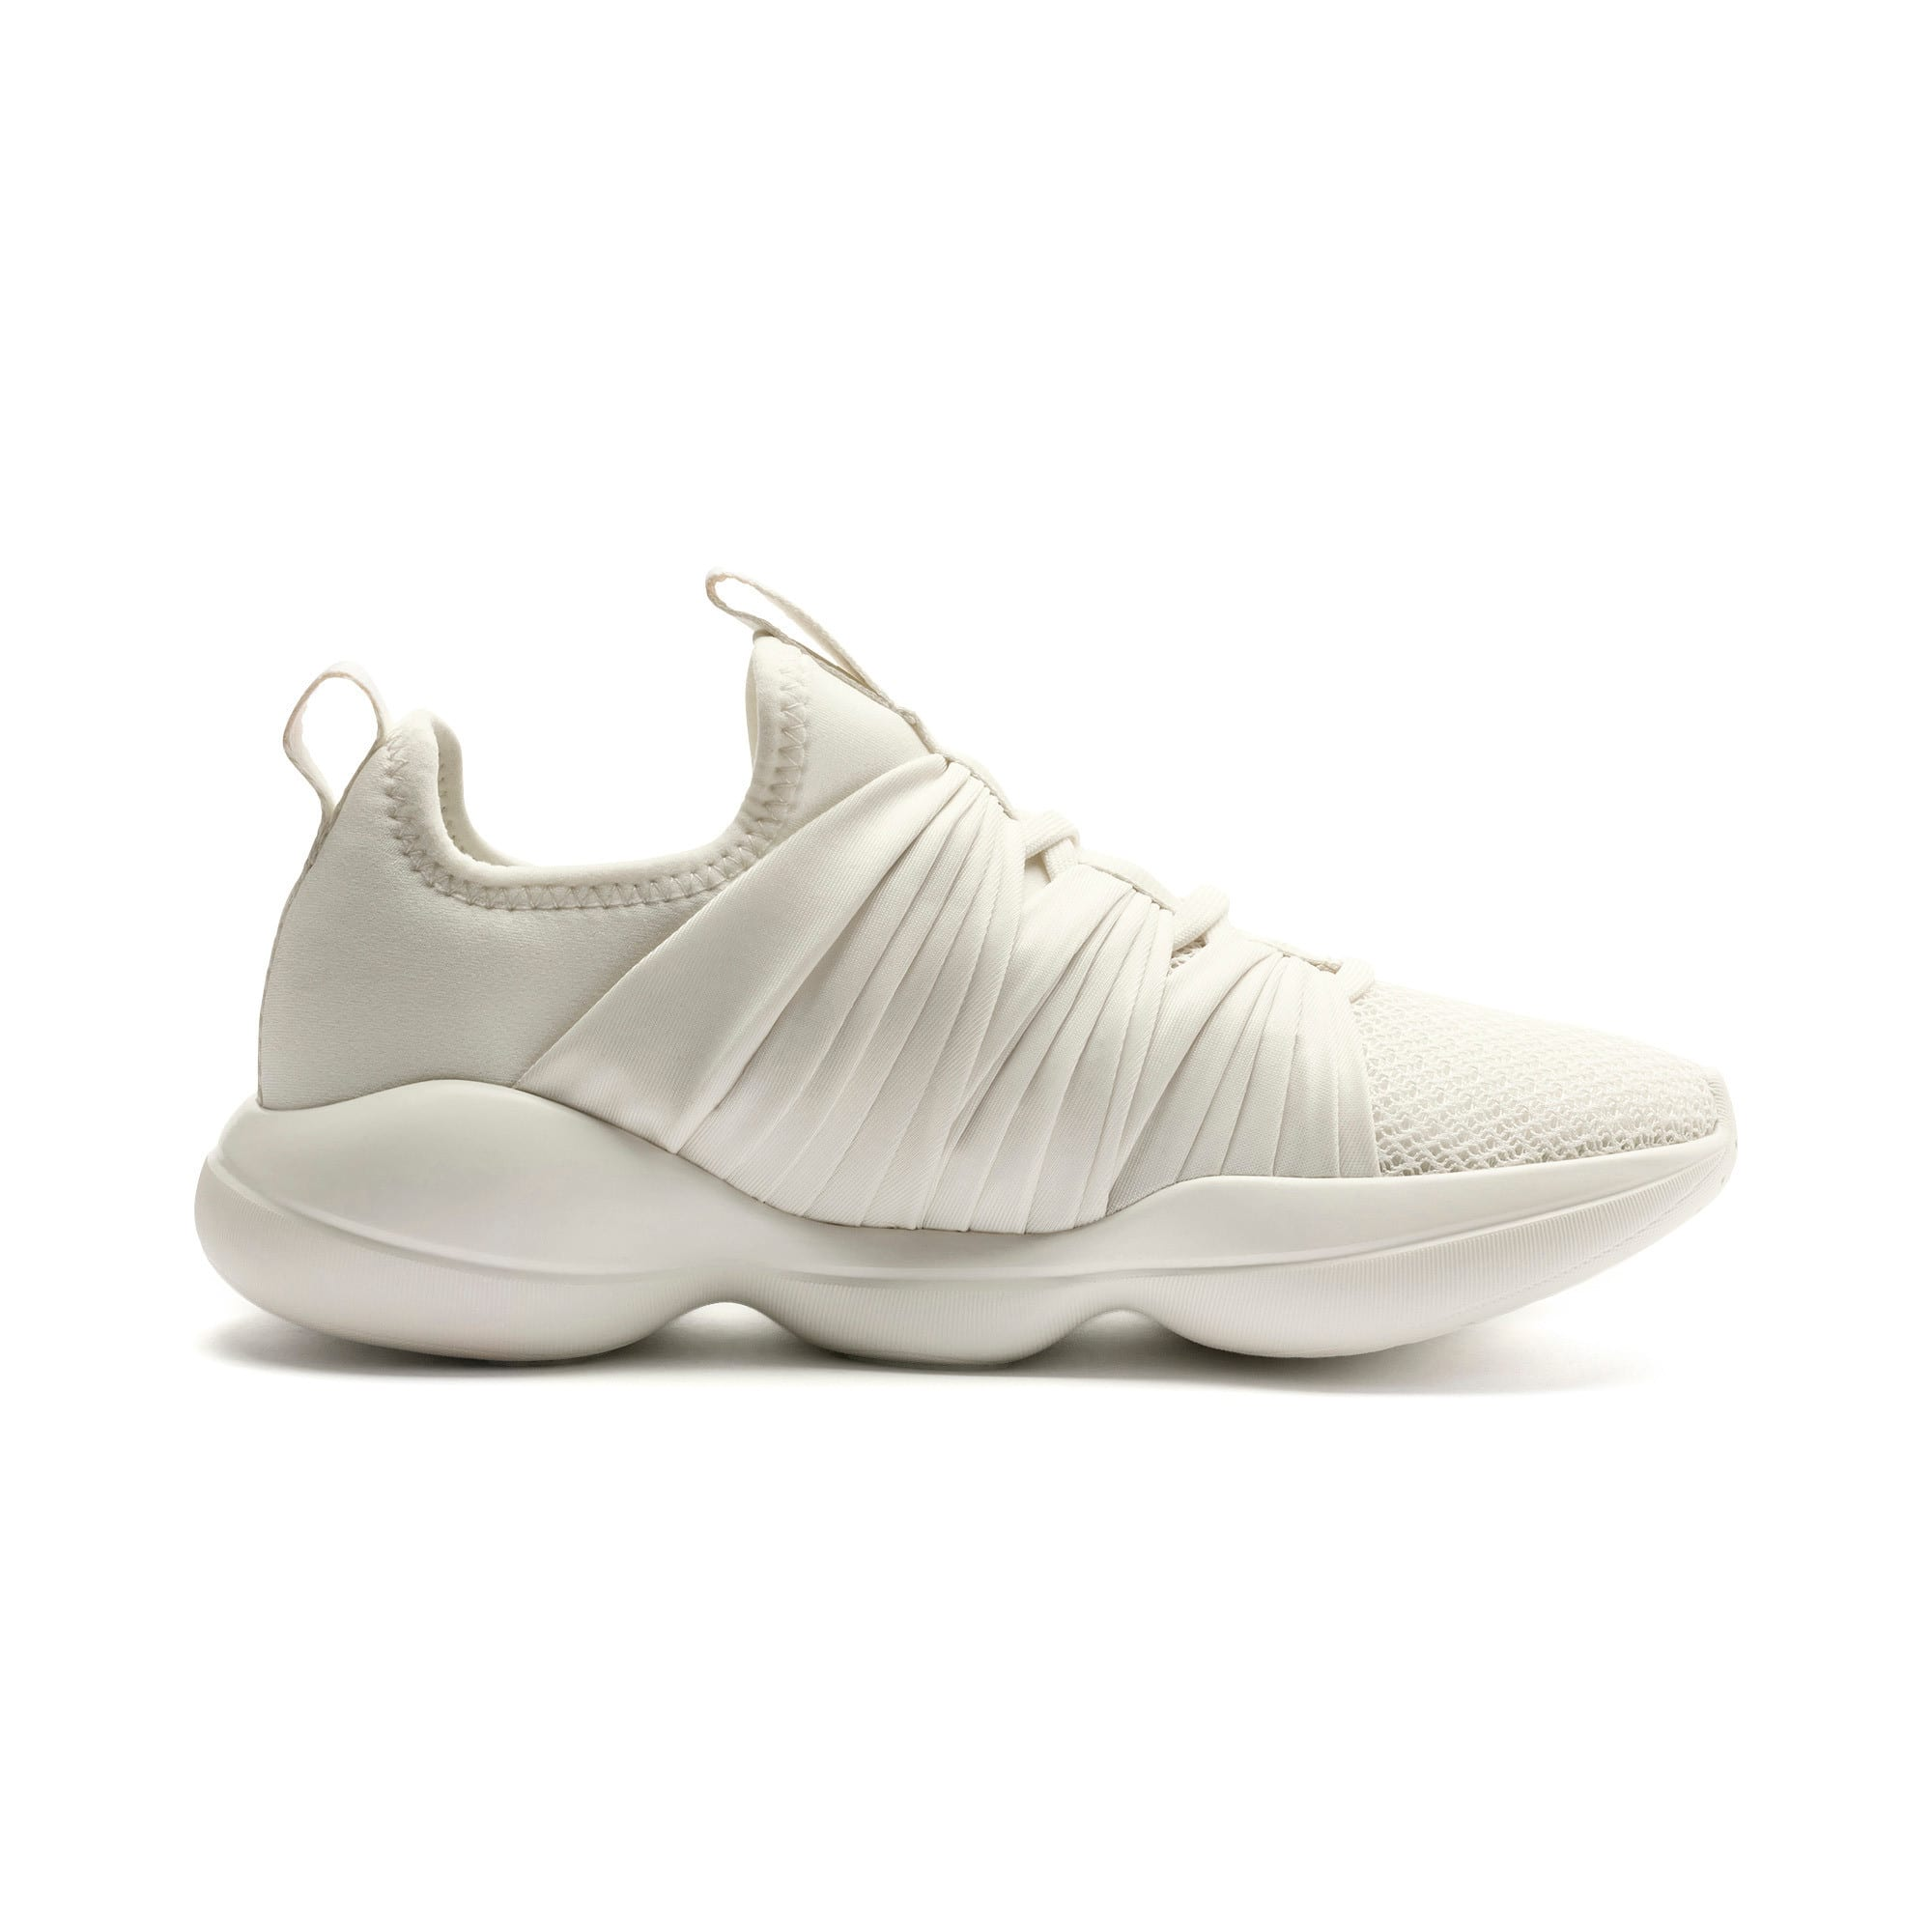 Thumbnail 5 of Flourish Women's Training Shoes, Whisper White-Puma White, medium